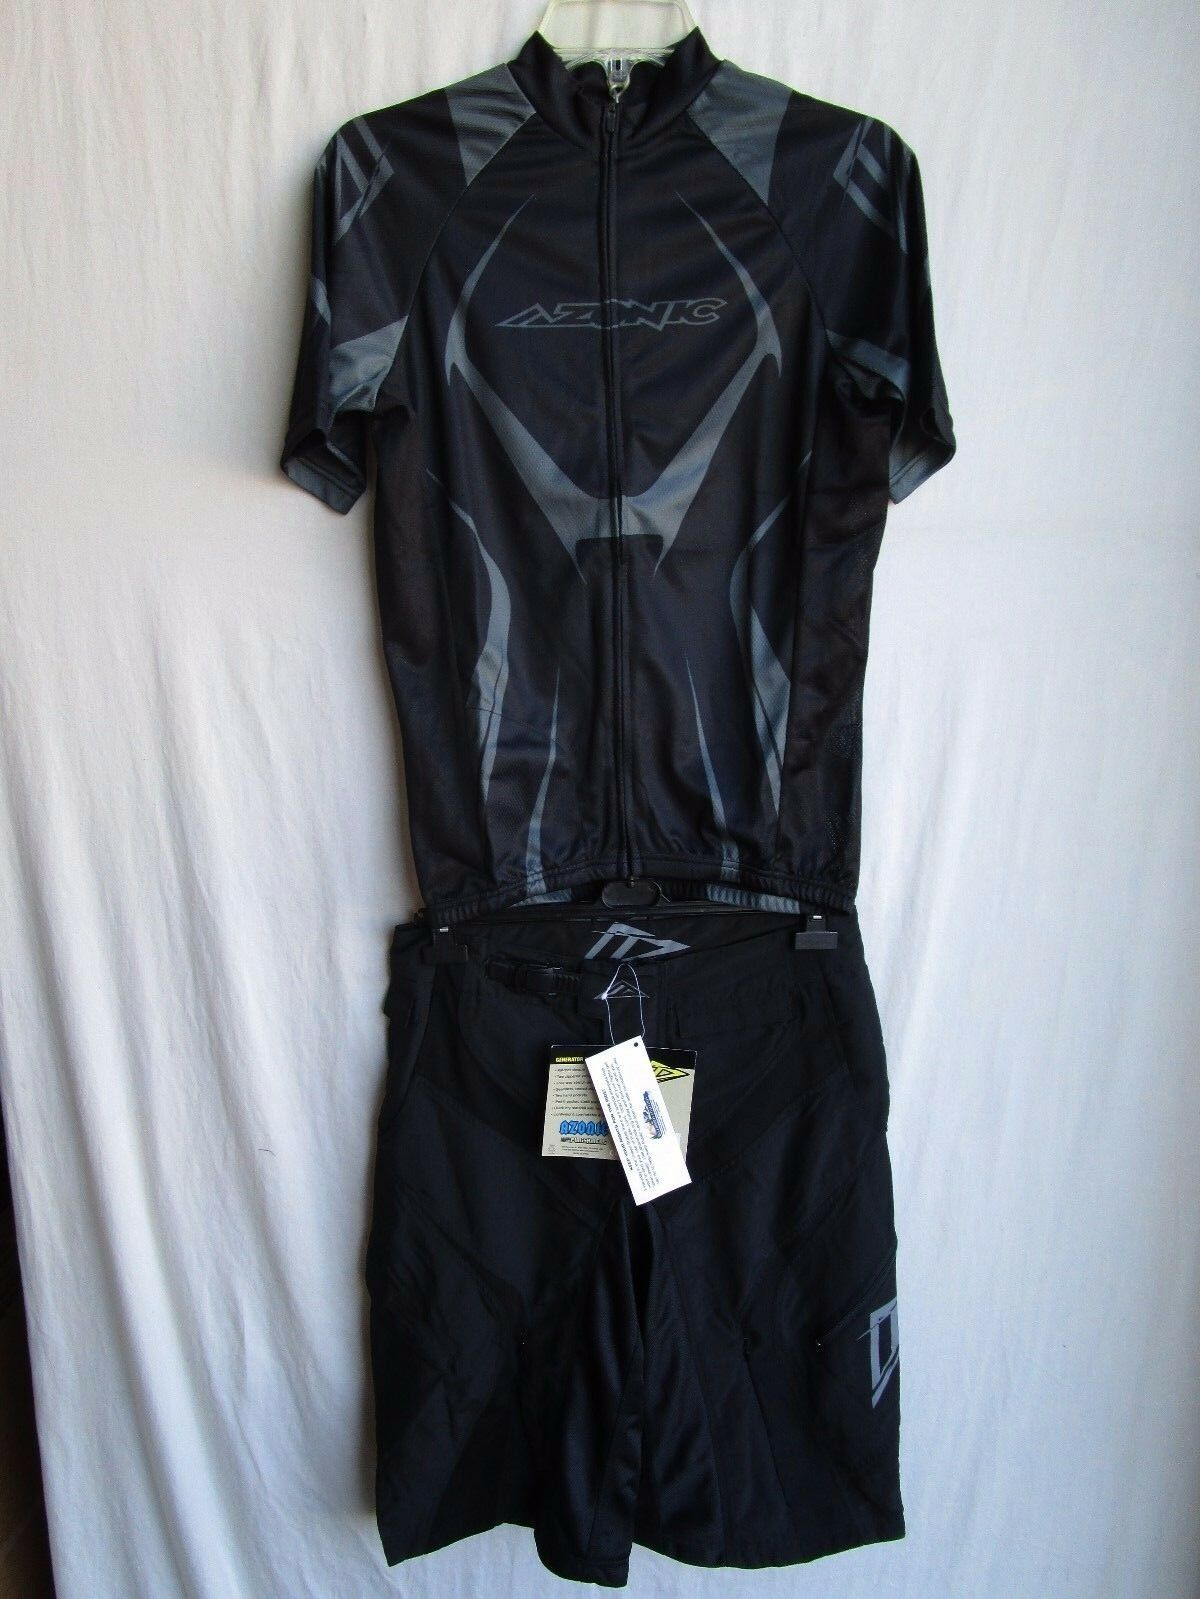 O'NEAL AZONIC Herren cycling combo SMALL set GENERATOR jersey sz SMALL combo & shorts sz 28 ffff80